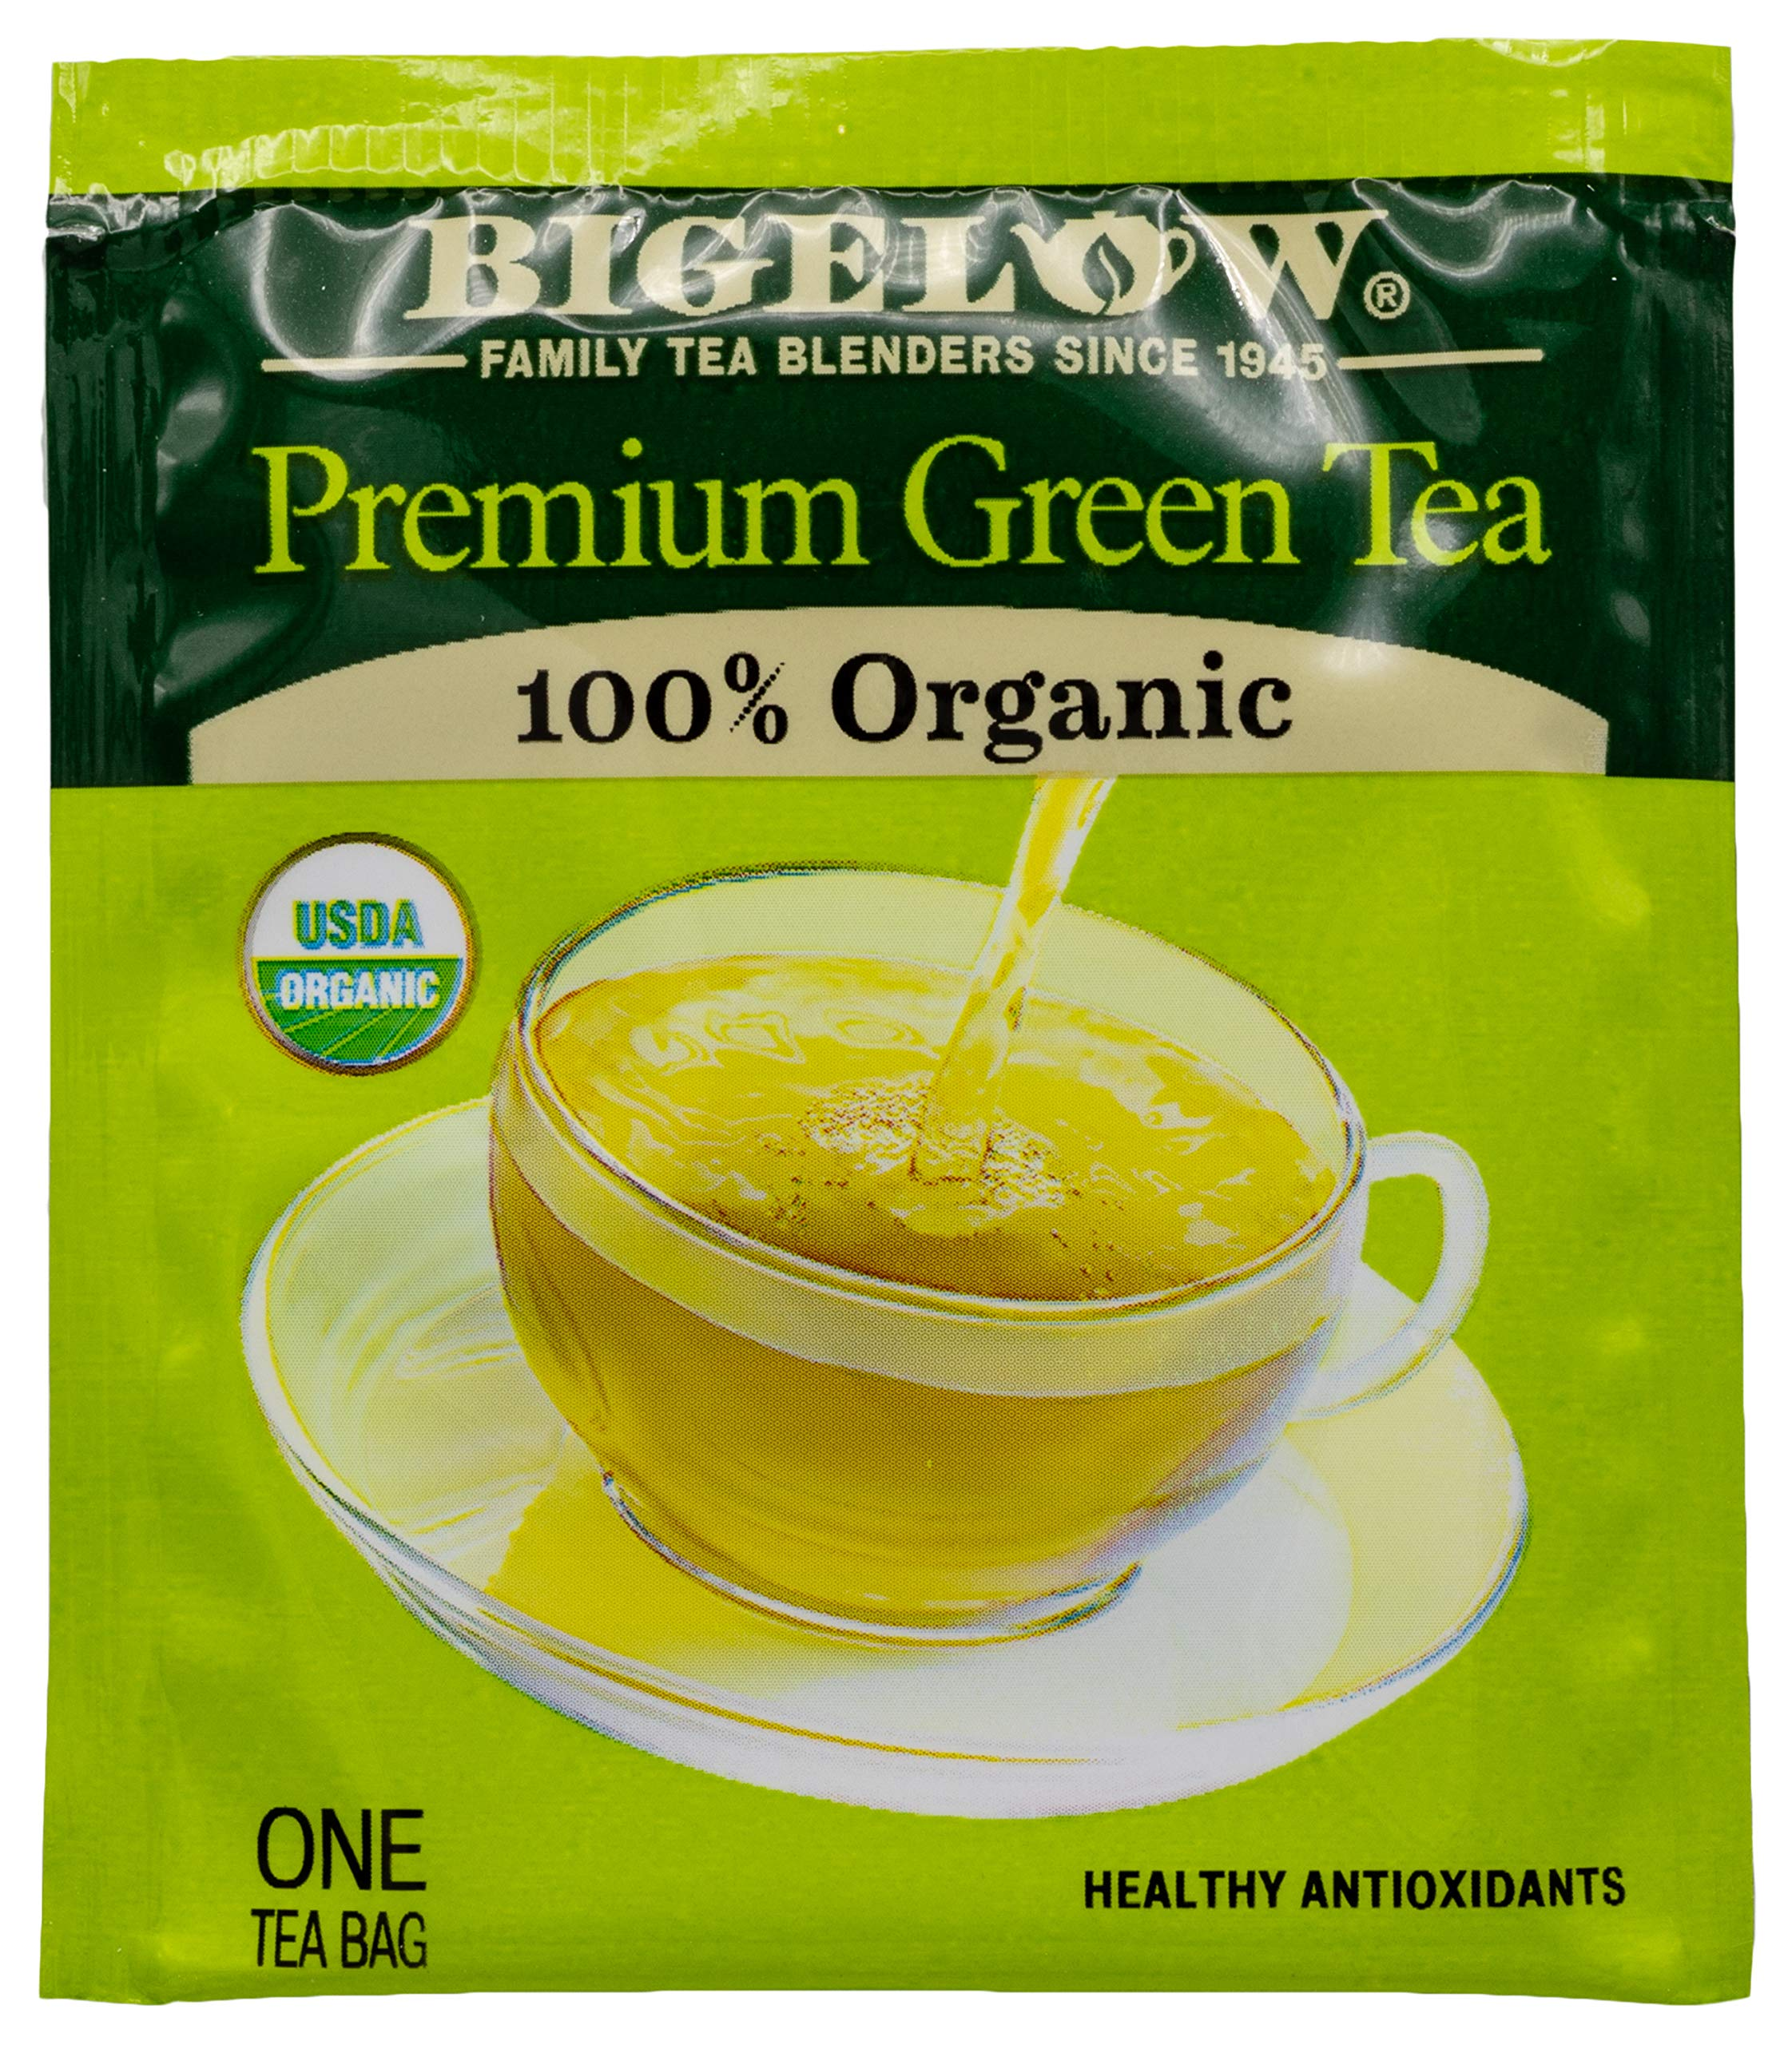 Bigelow Premium Green Tea Bags, 176 Count Box, Caffeinated Individual Green Tea Bags, for Hot Tea or Iced Tea, Drink Plain or Sweetened with Honey or Sugar by Bigelow Tea